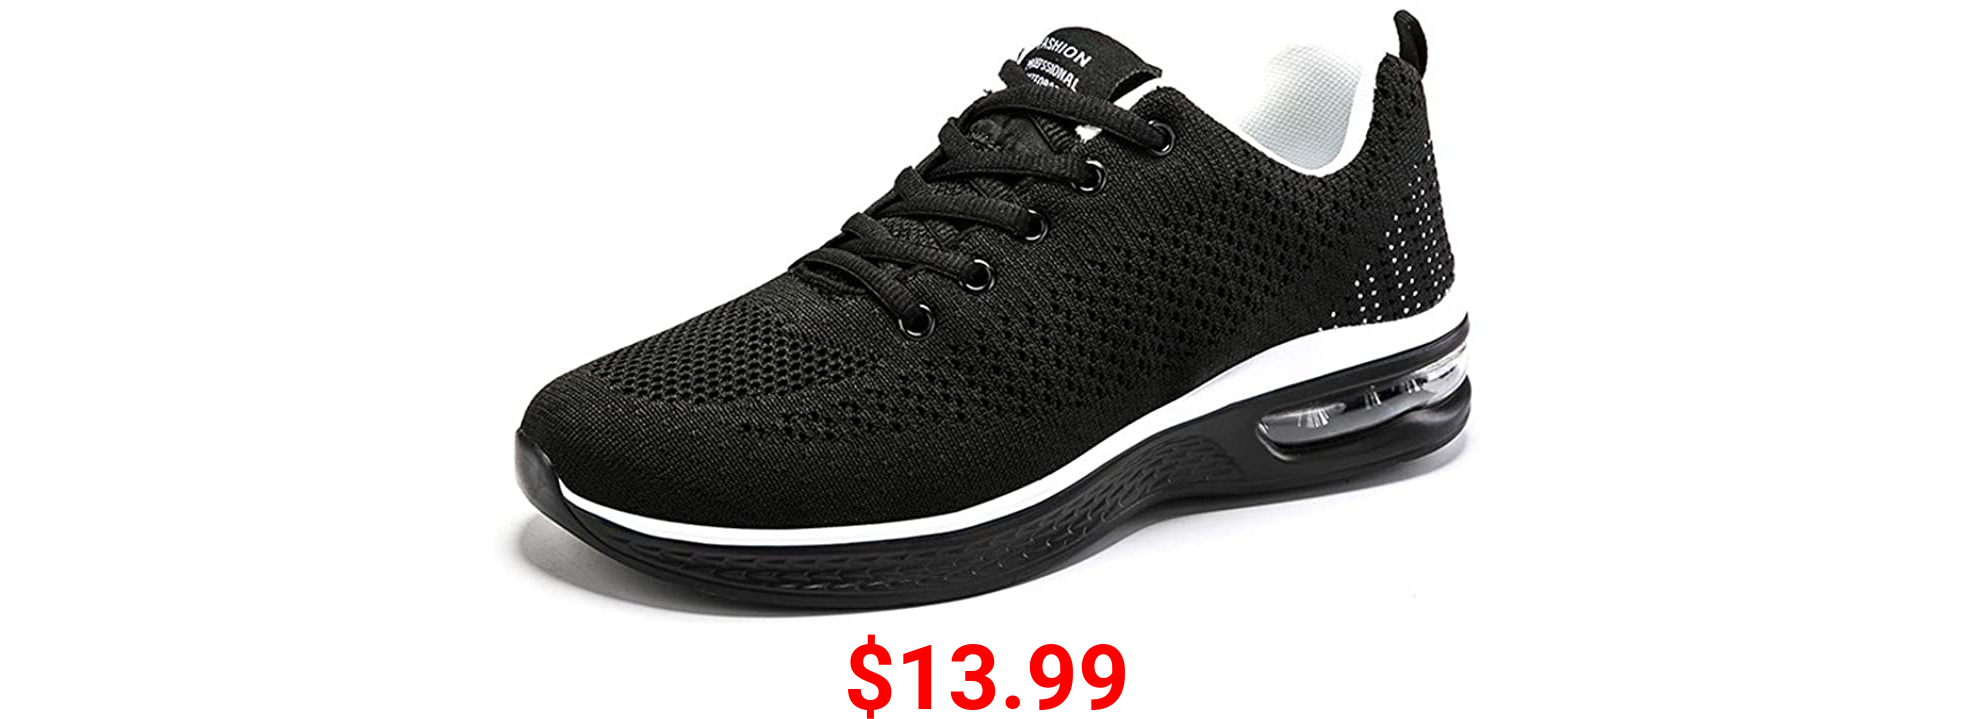 FJPTREN Men's Running Shoes Sports Sneakers for Walking,Hiking,Training